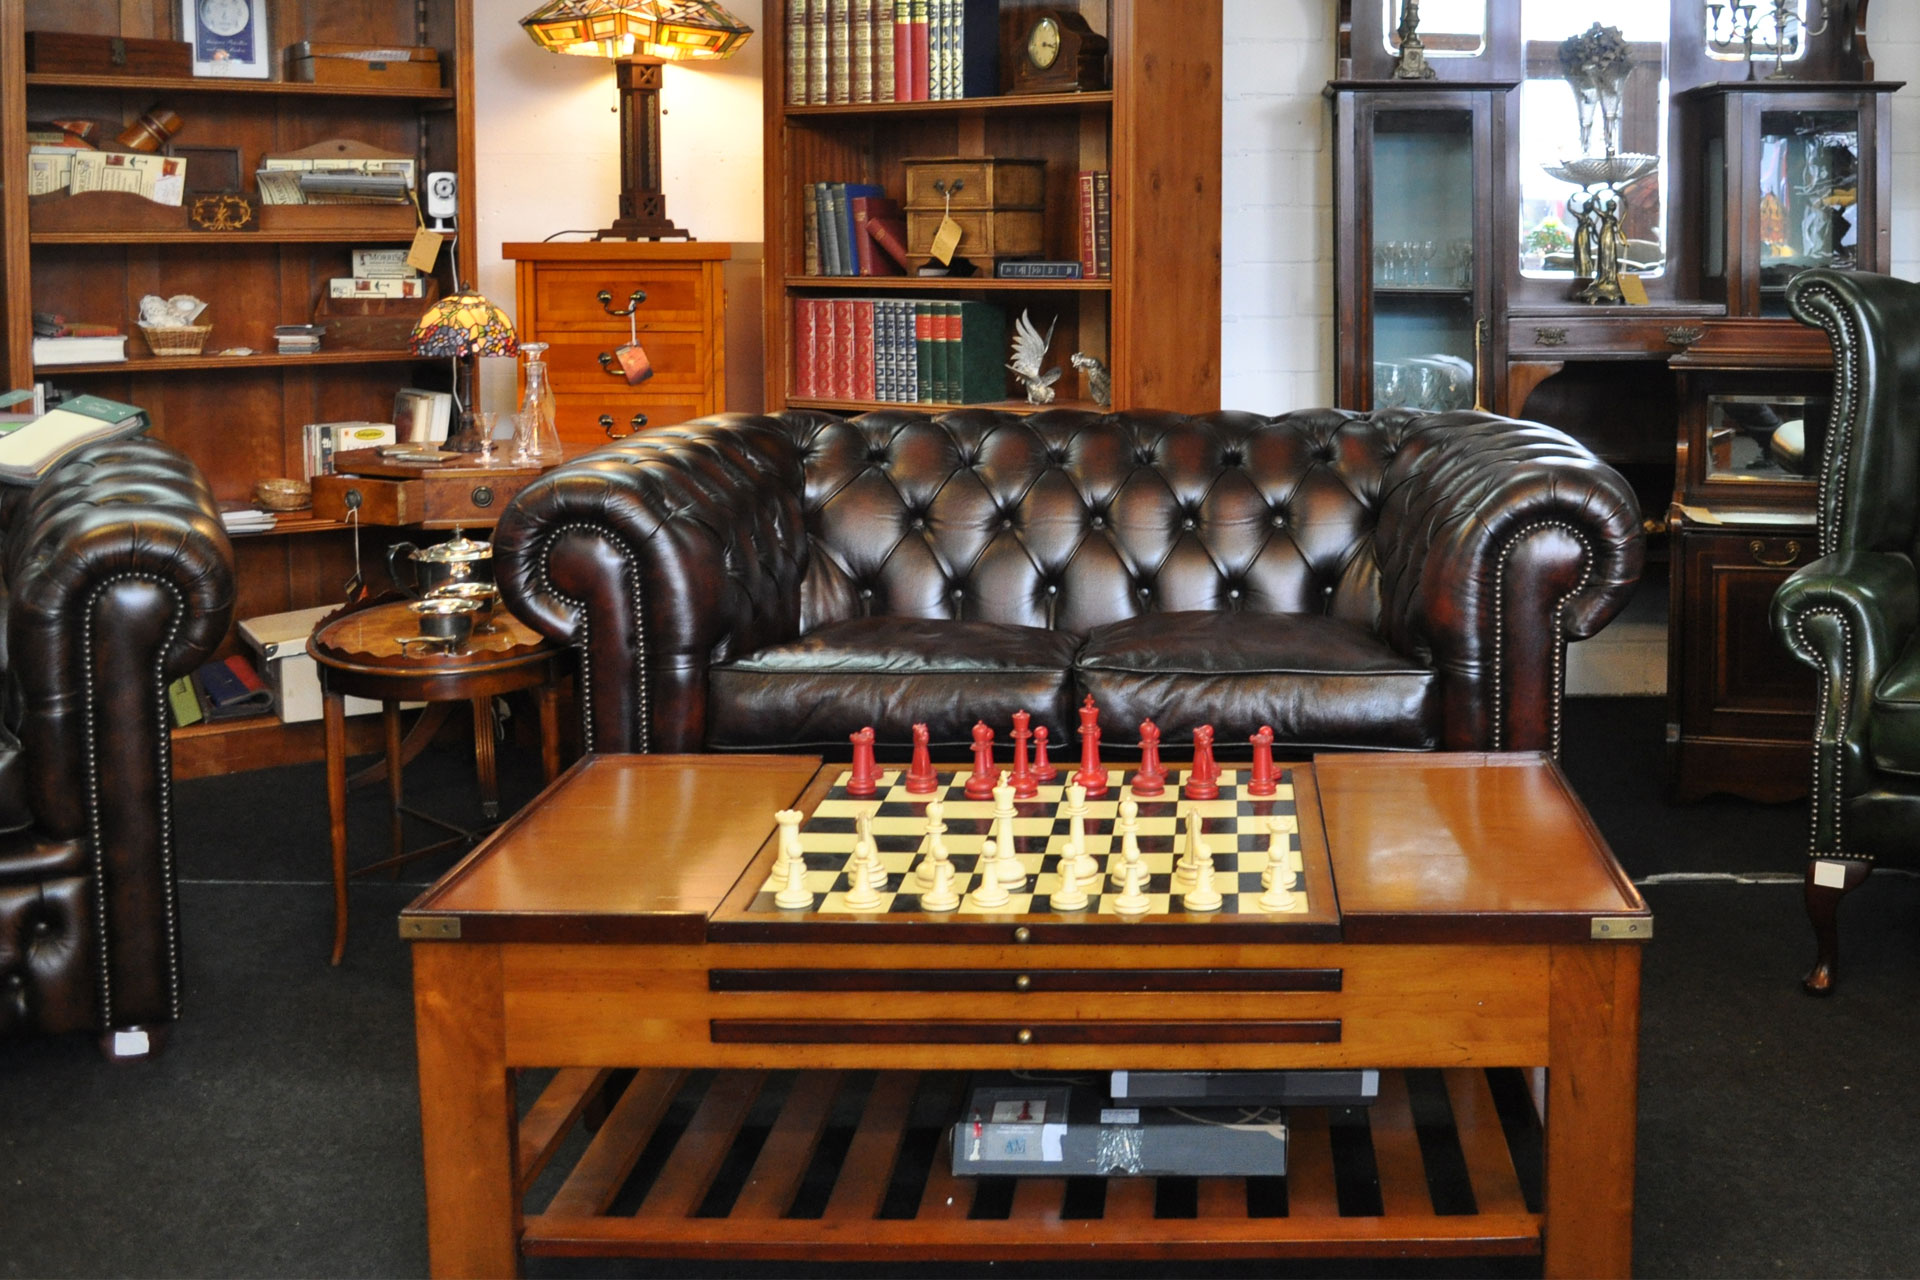 Full Size of Chesterfield Sofa Gebraucht Sessel Mega Freistil Petrol Ebay Kolonialstil Graues Bezug Big Grau Leinen Für Esstisch Günstig Bett Zweisitzer Abnehmbarer Sofa Chesterfield Sofa Gebraucht